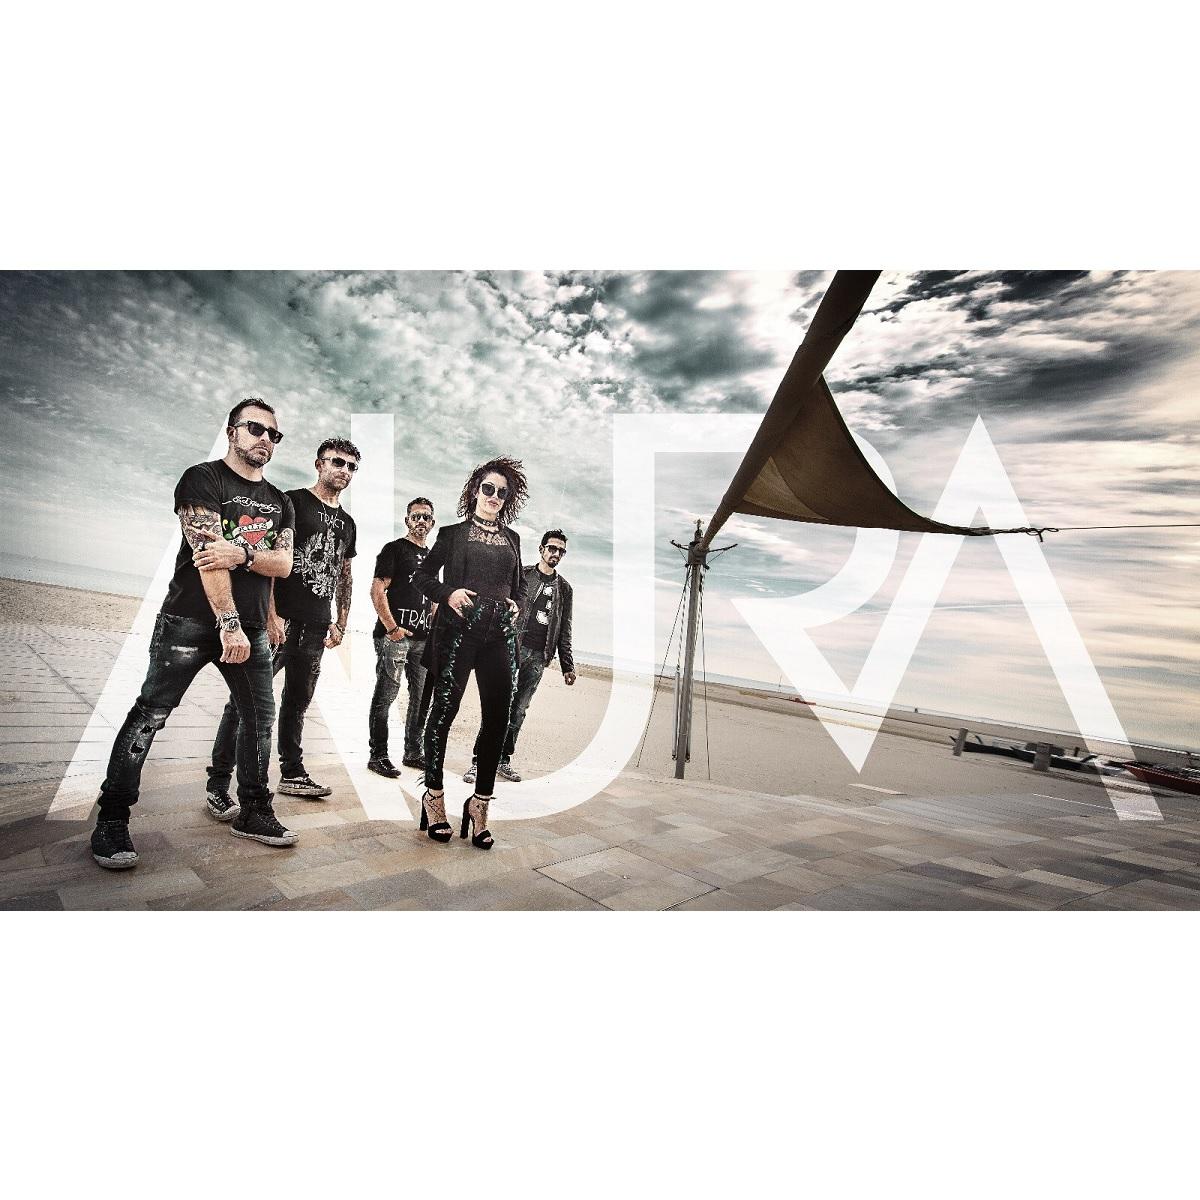 Aura Live Band al Pescara City Summer 10 luglio 2021 foto